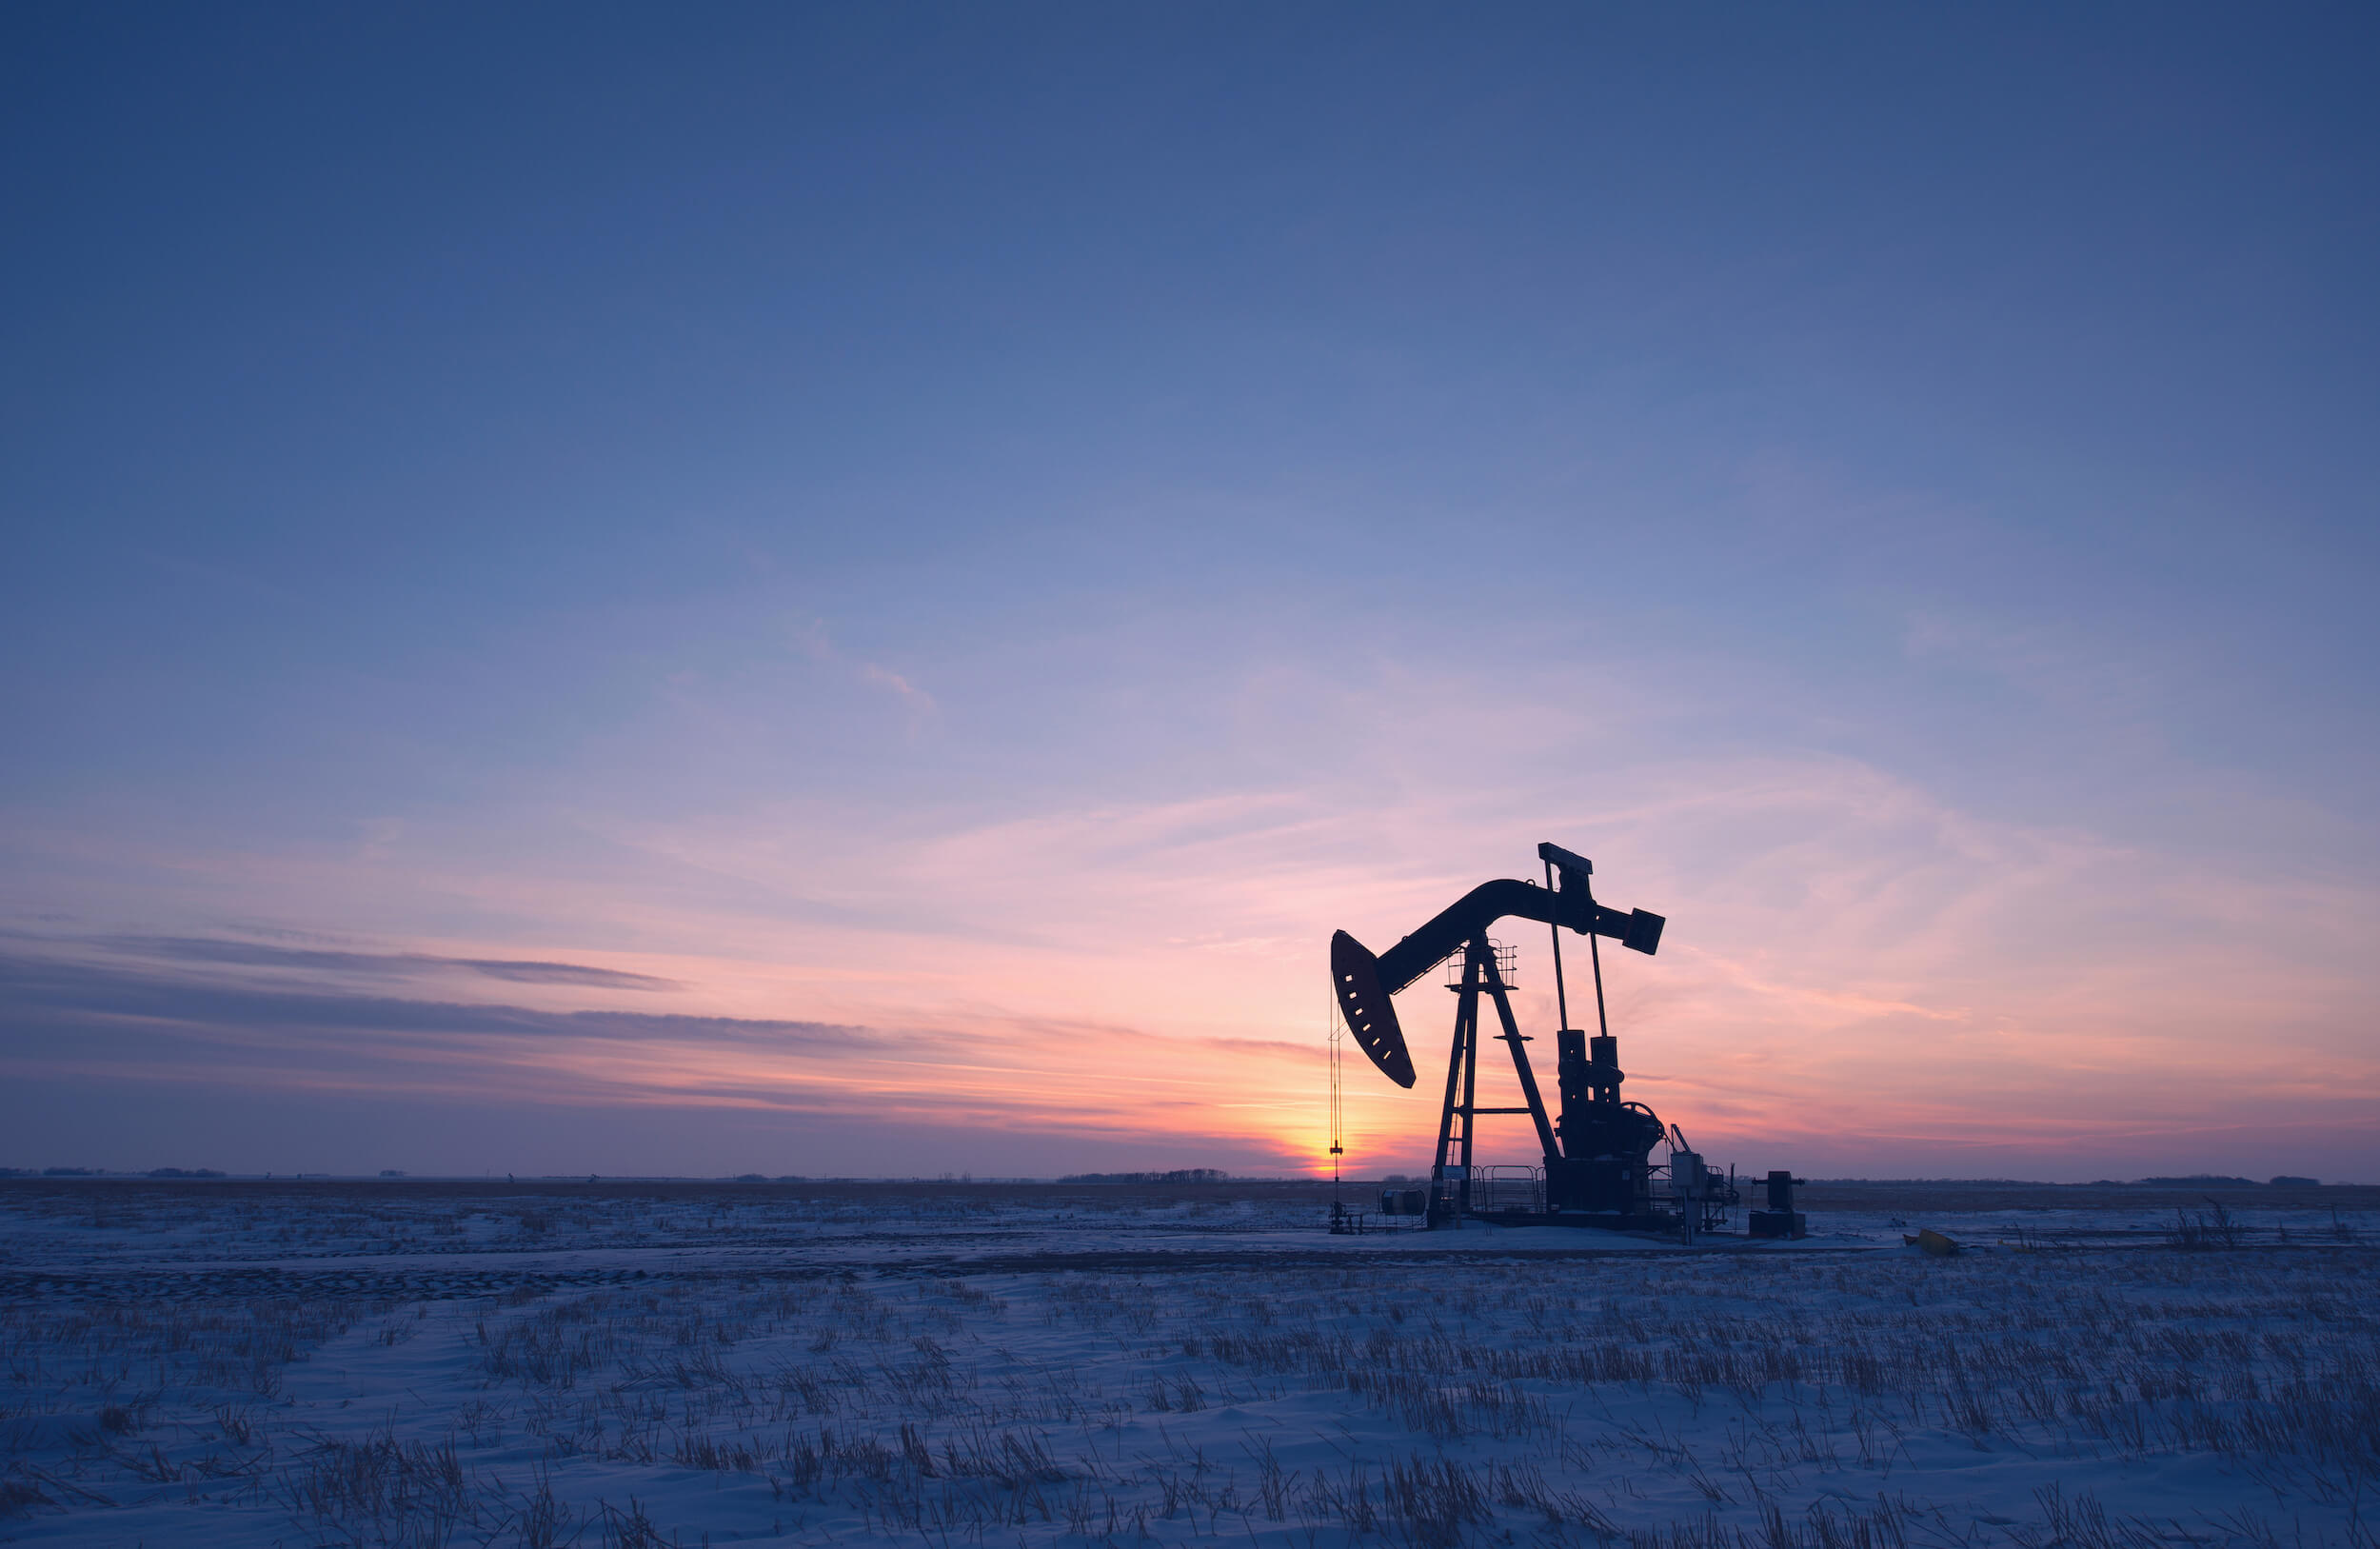 Landscape photo of an oil pump jack at dusk